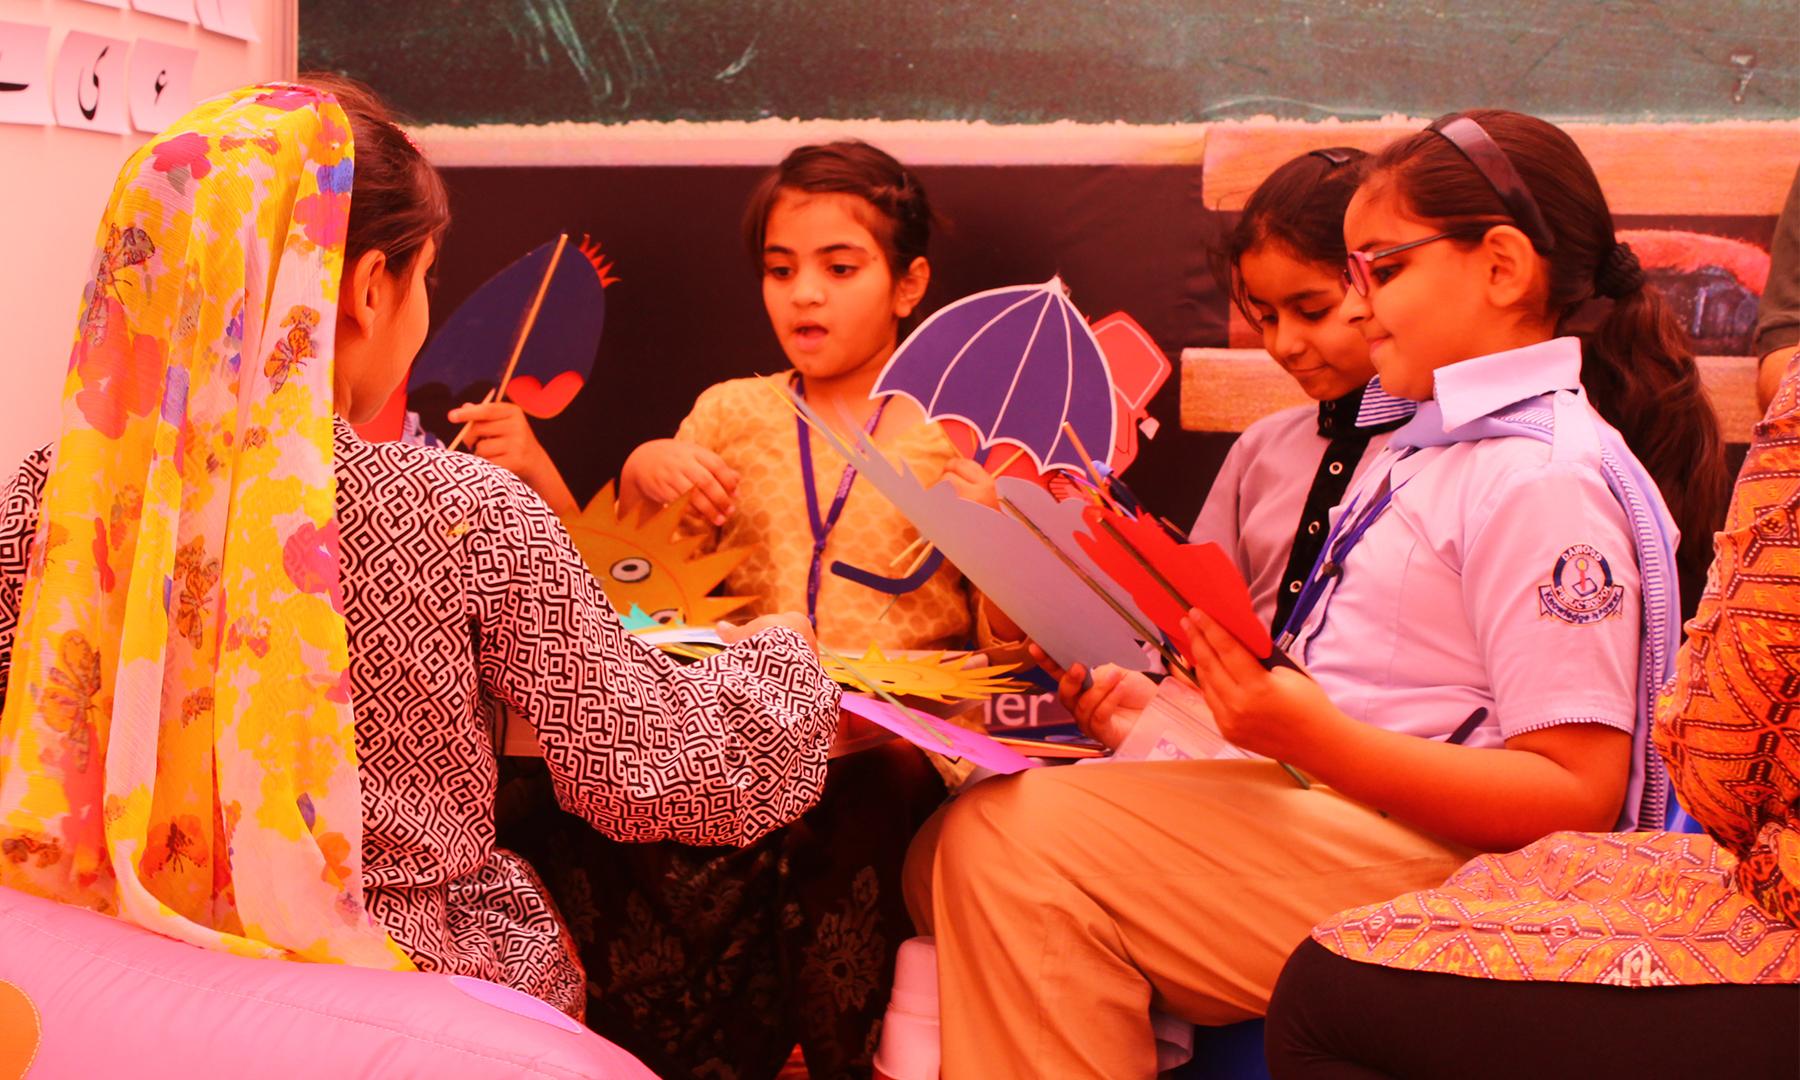 Children's Literature Festival: Of inspiration and adventures